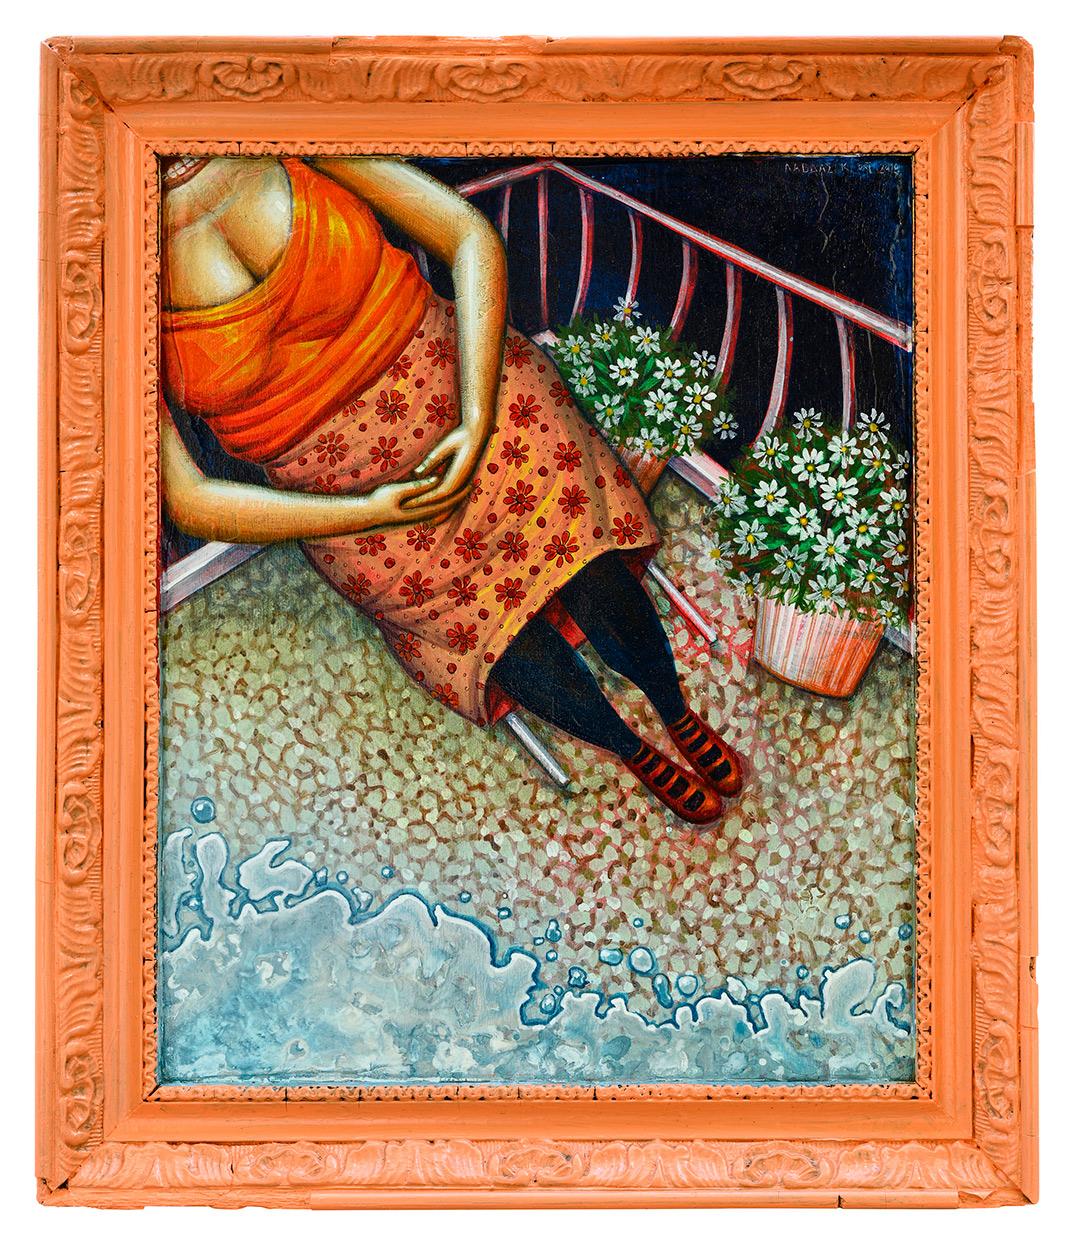 On the balcony, 29 x 34 cm, Acrylics on wood